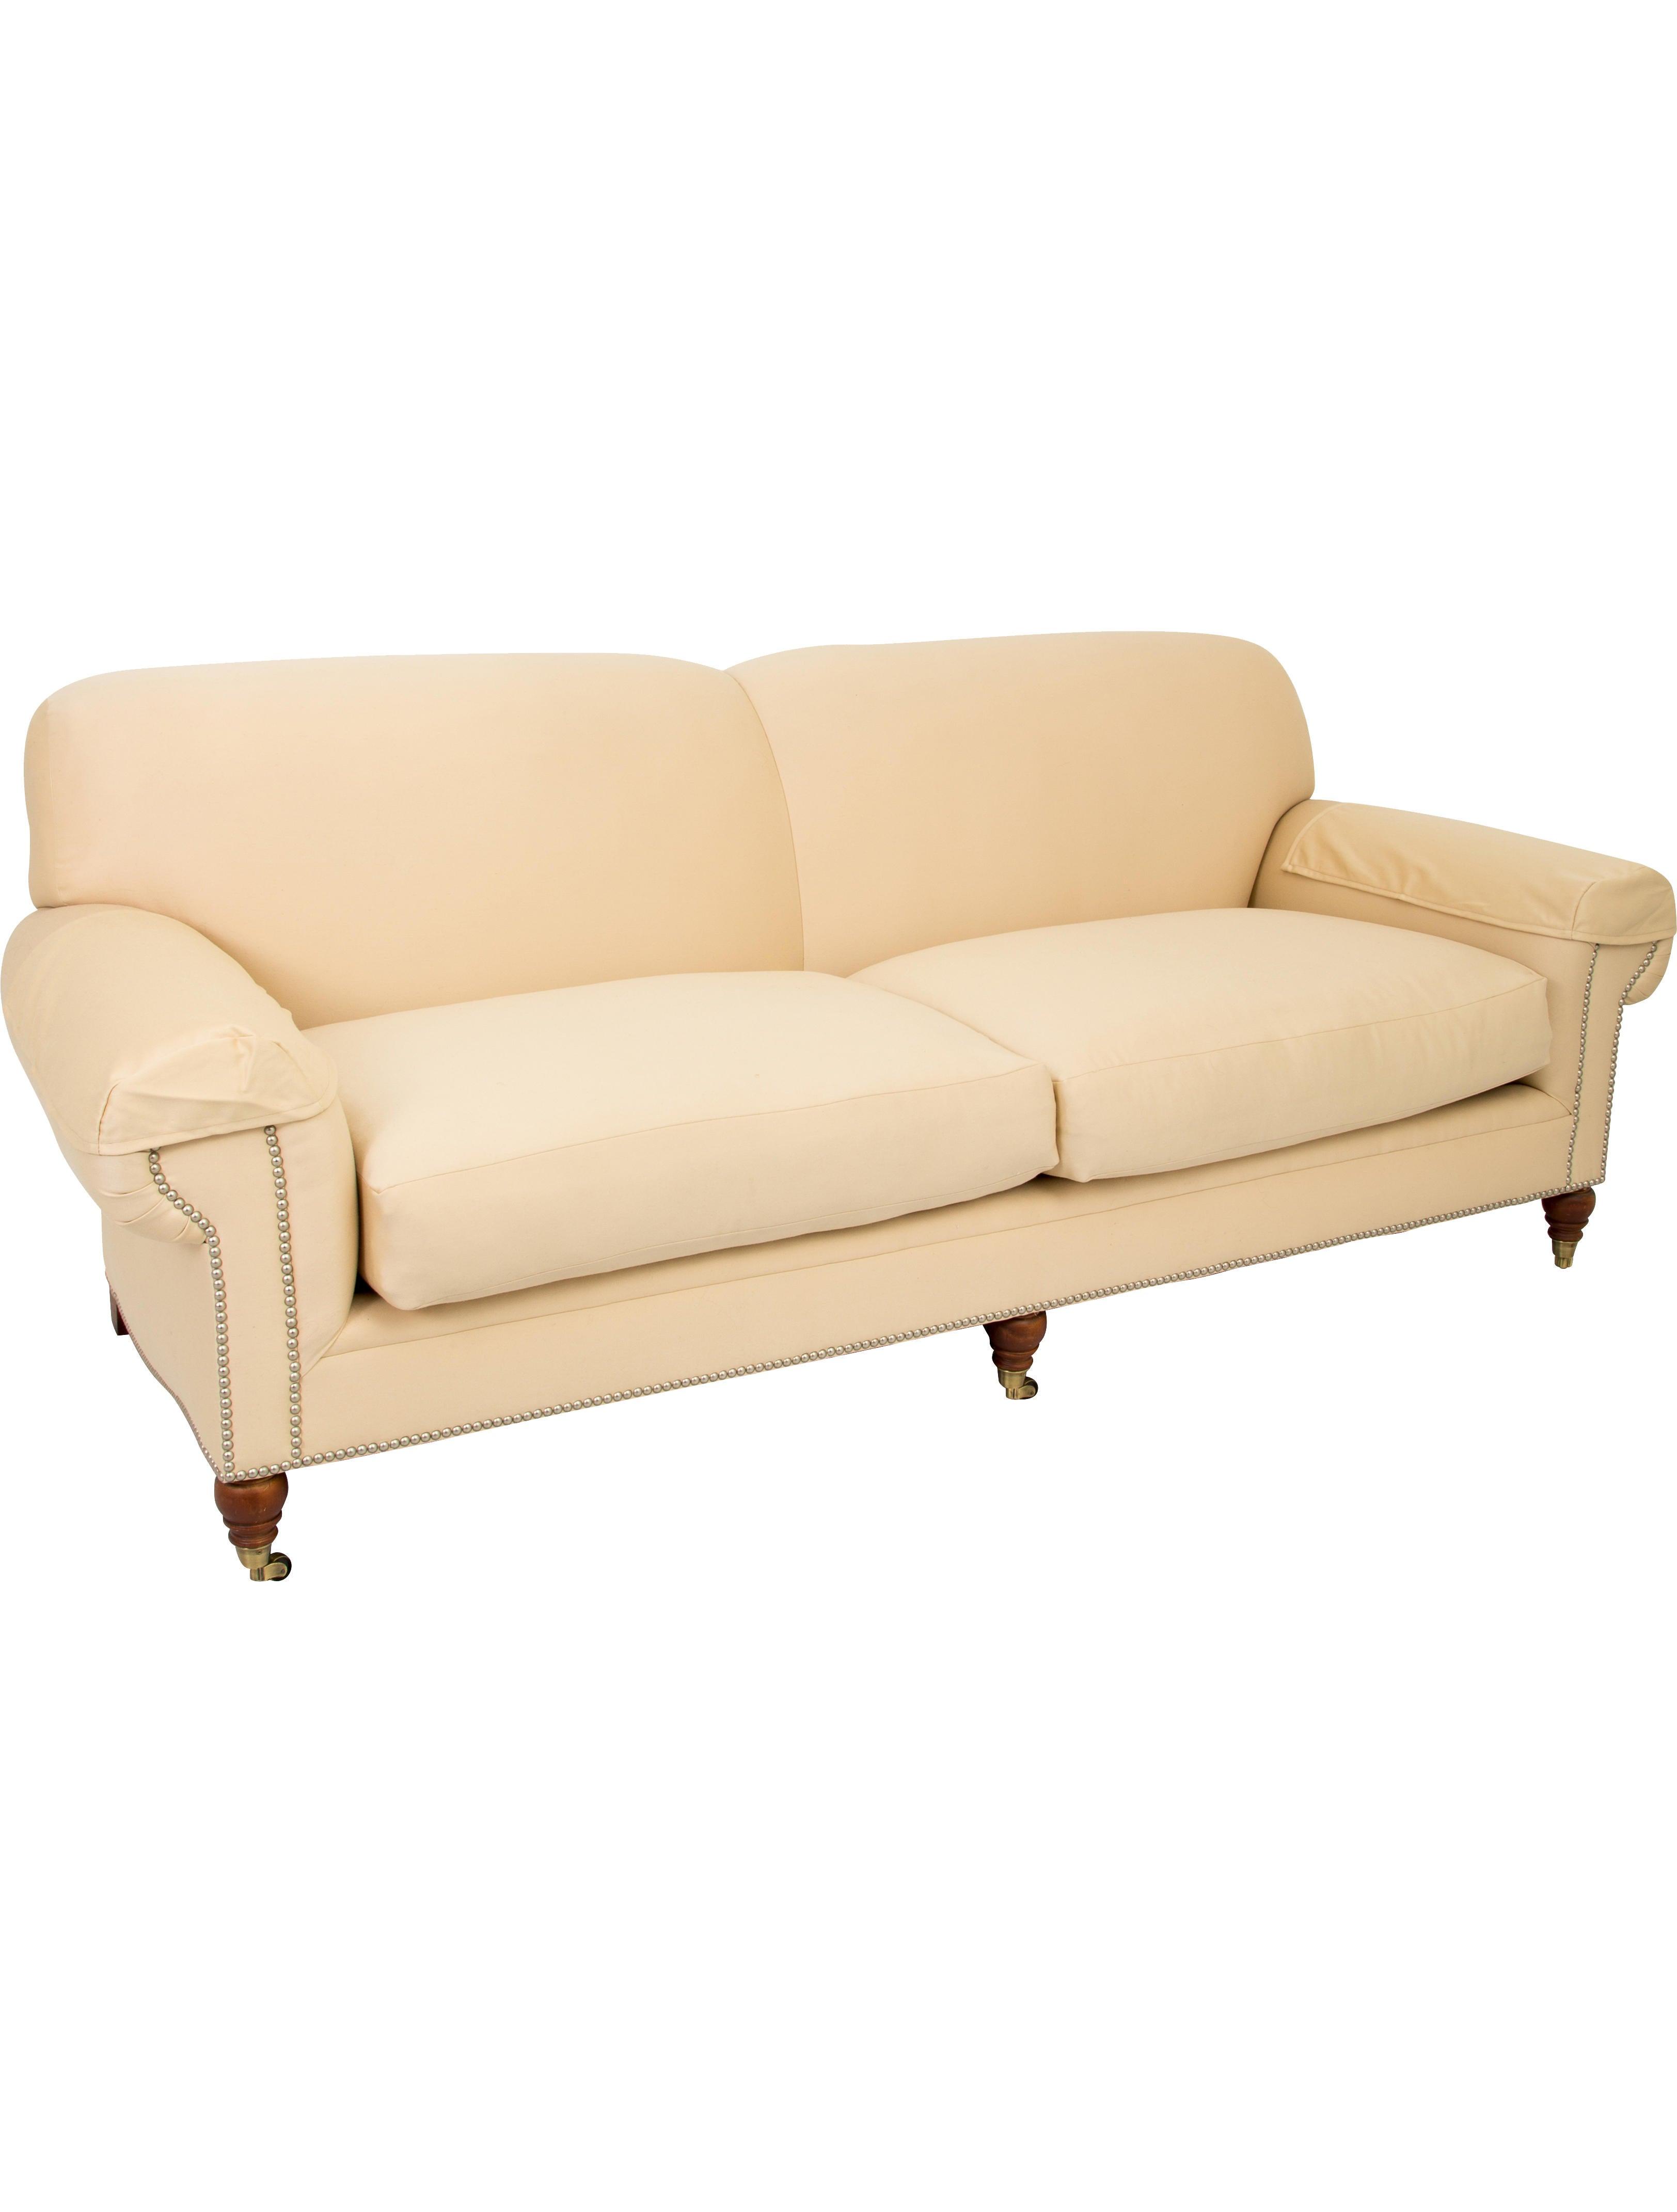 Ralph lauren two seat sofa furniture wyg21479 the for Ralph lauren outdoor furniture